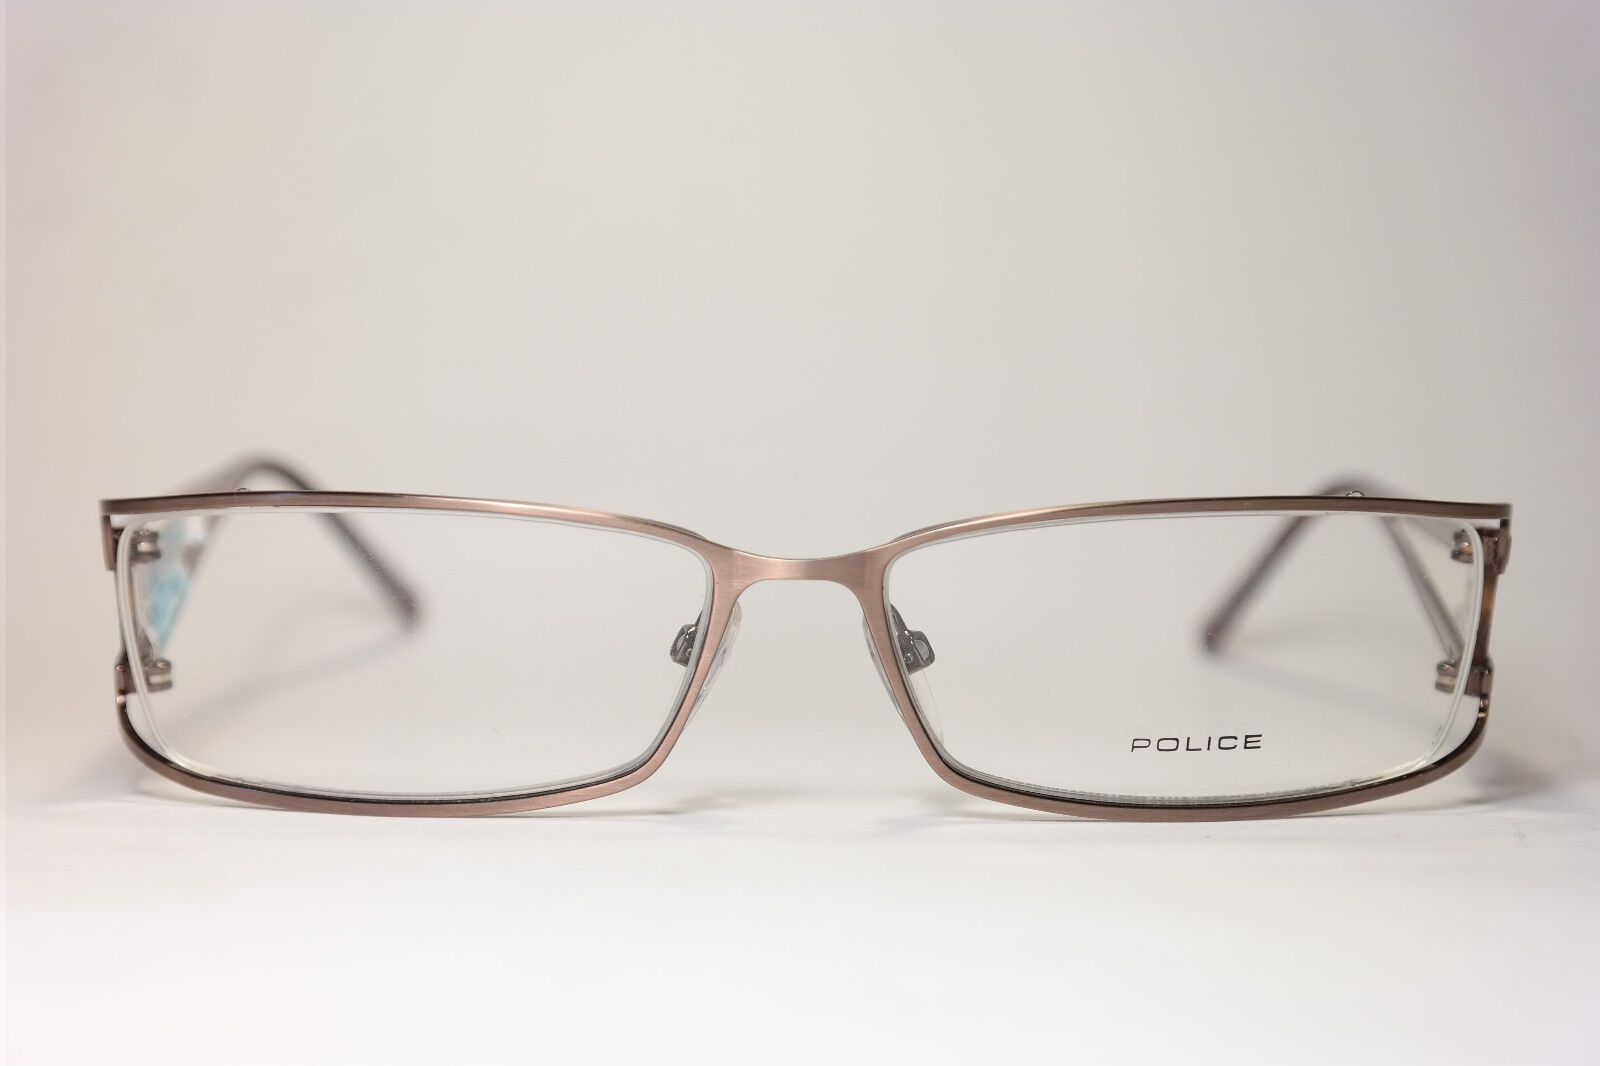 Police V8068 Col. SD3  55[]15 135 Rot Silber oval Brillengestell Brille NEU